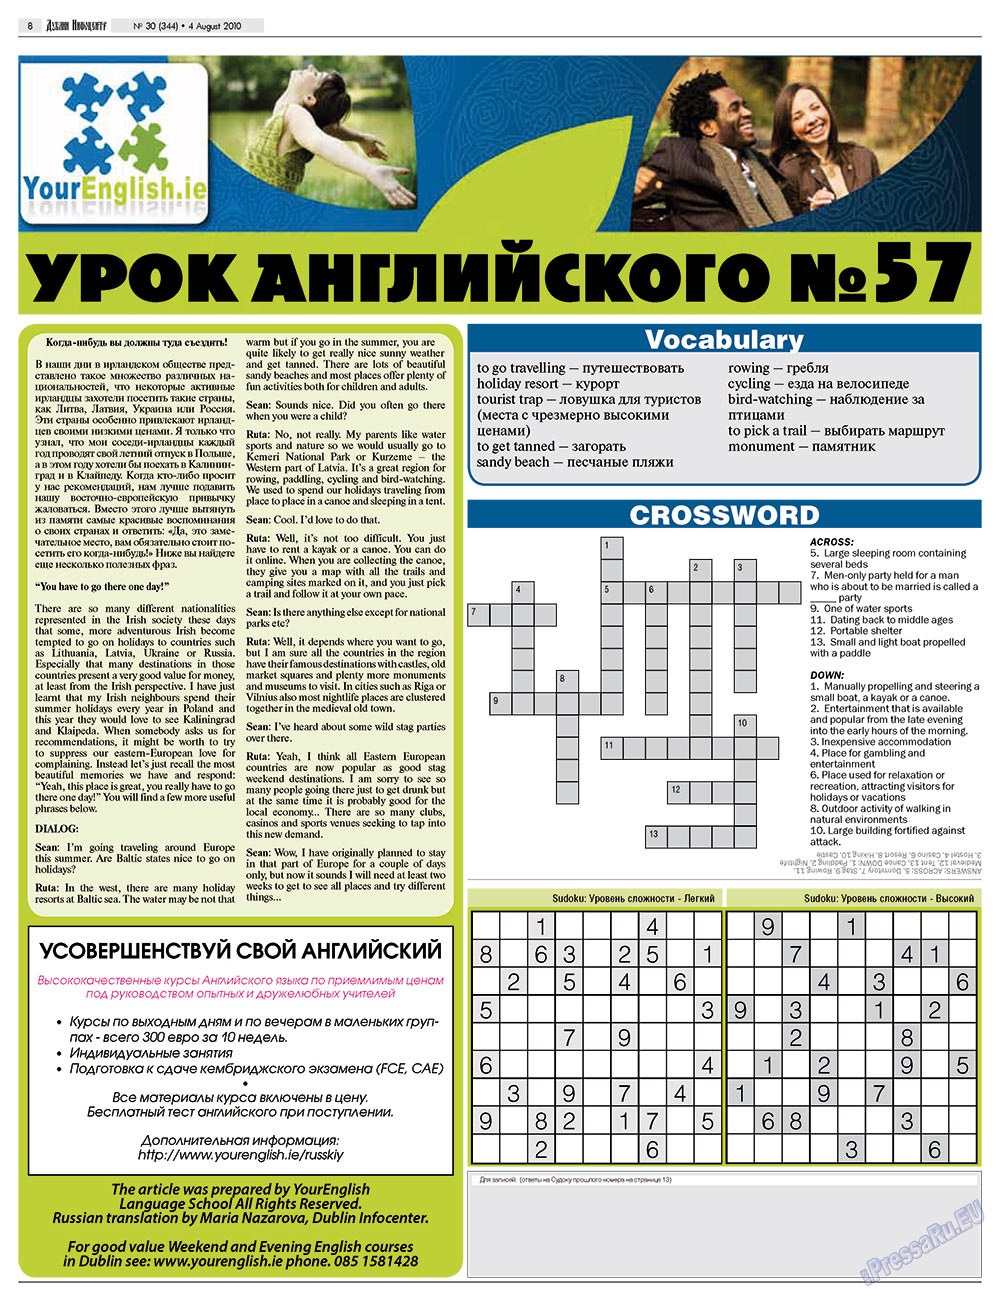 Дублин инфоцентр (газета). 2010 год, номер 30, стр. 8